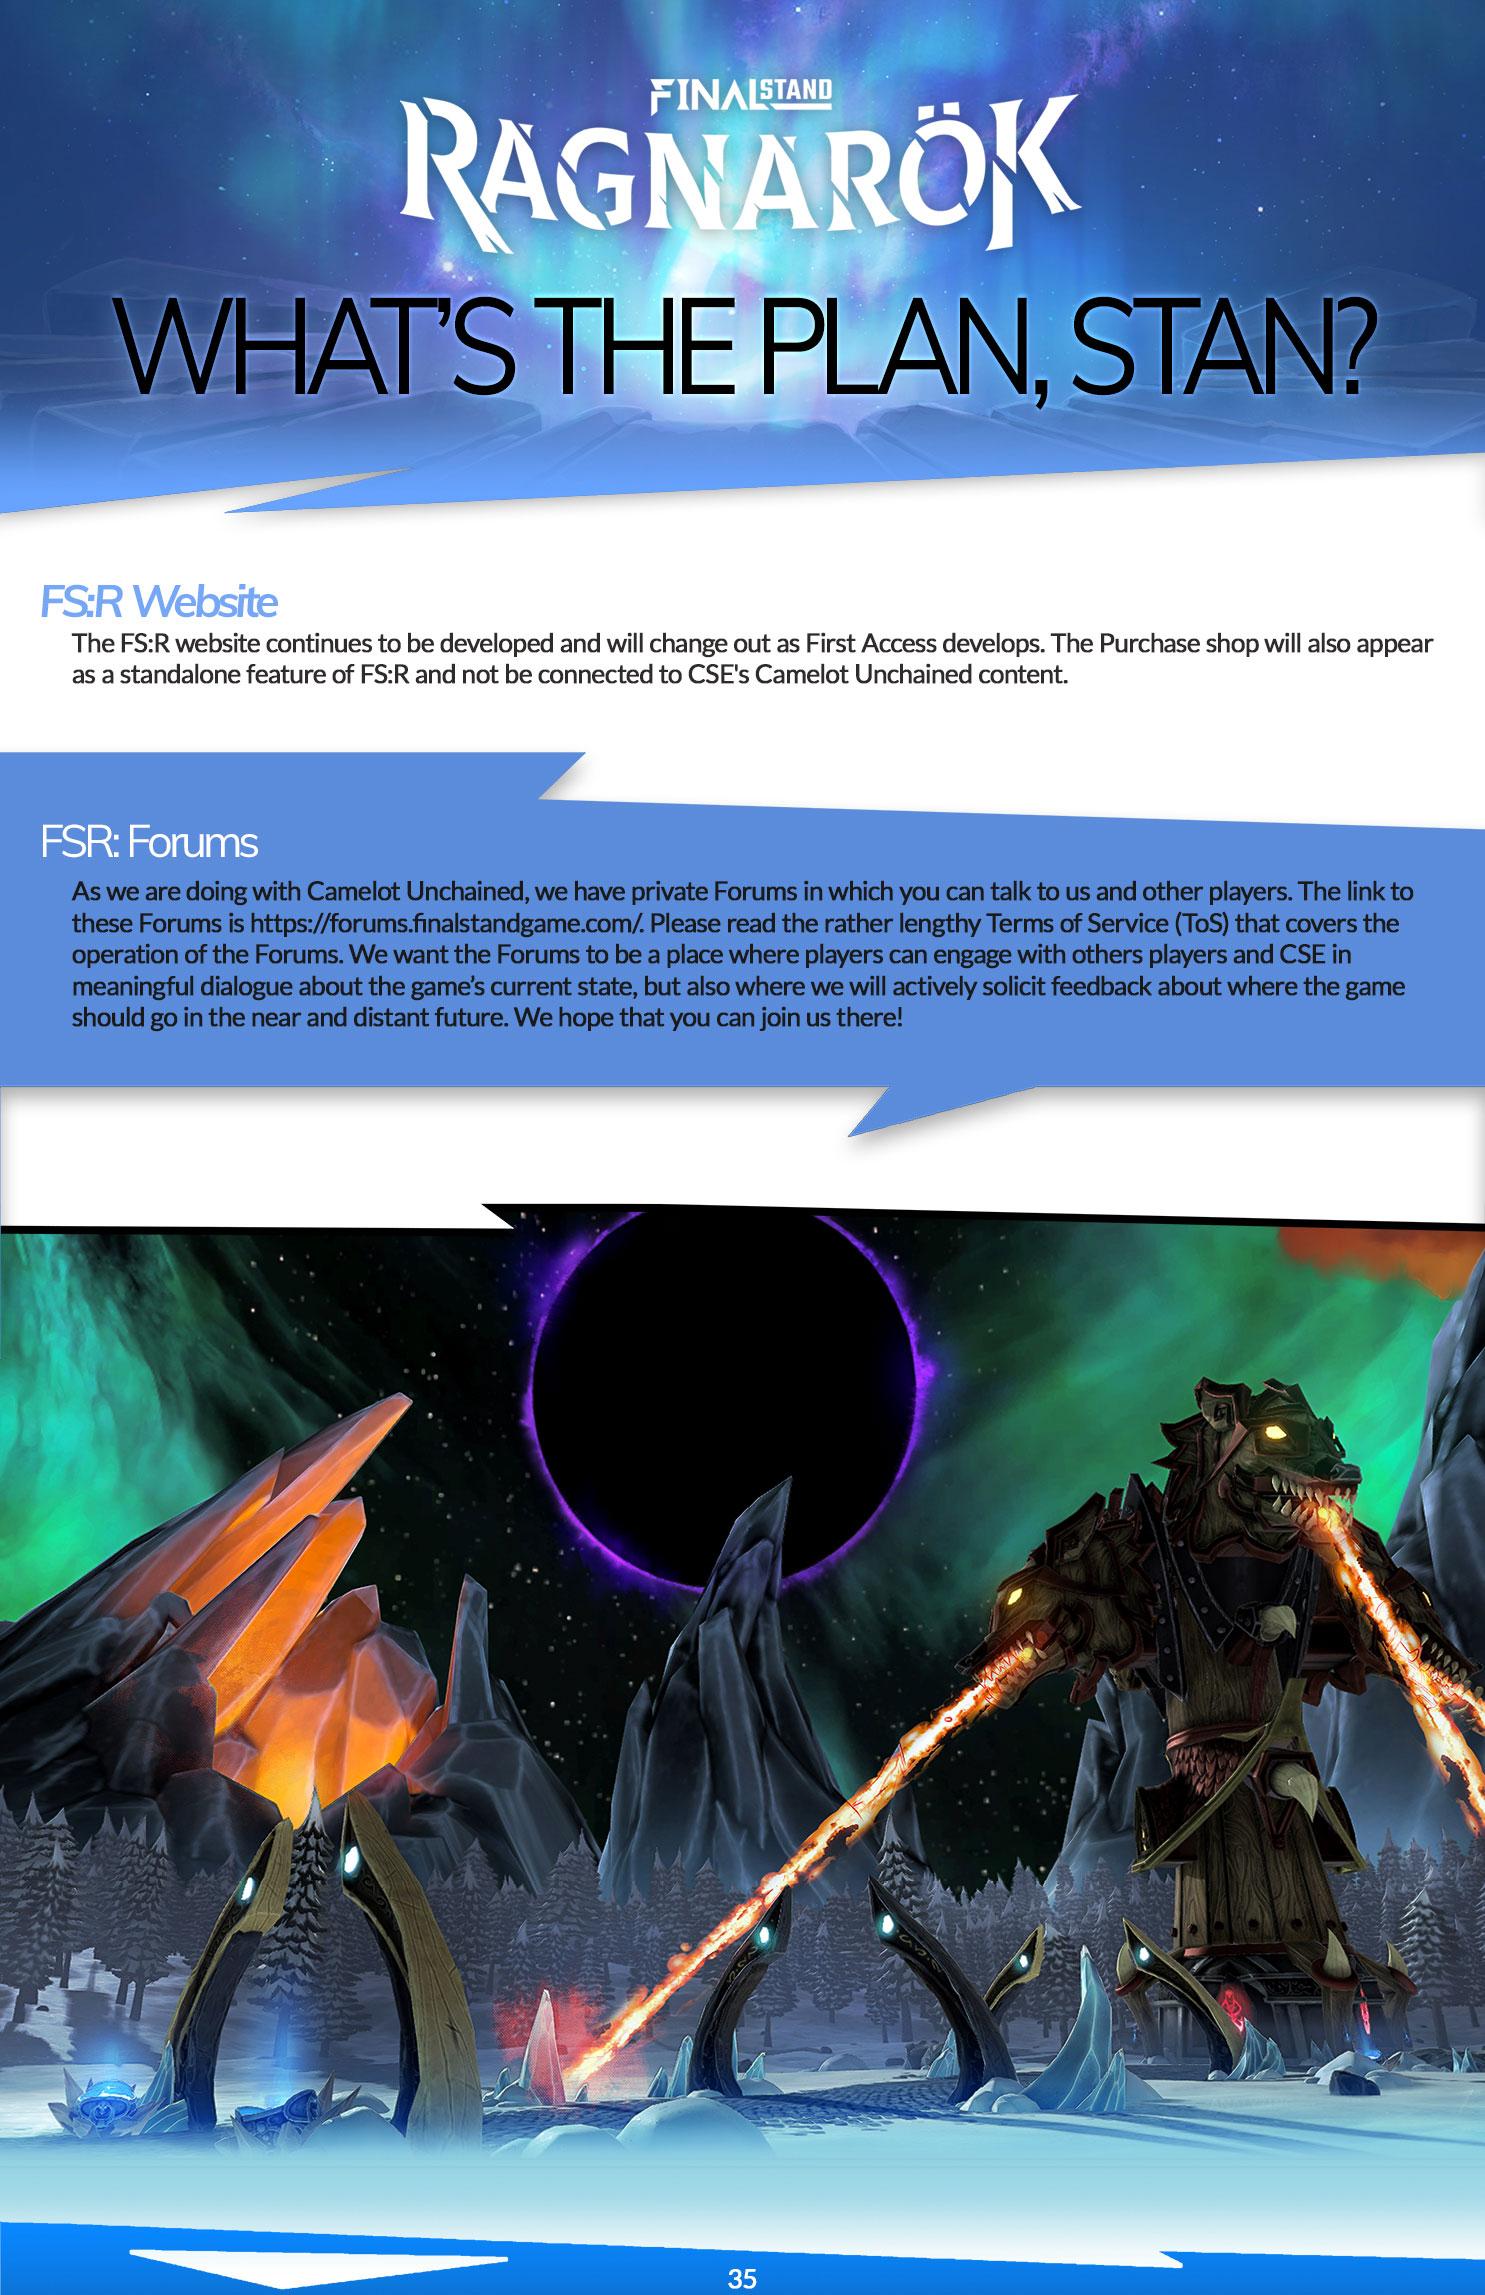 FSR-Guide_11x17_master_17-Final-for-FA-36